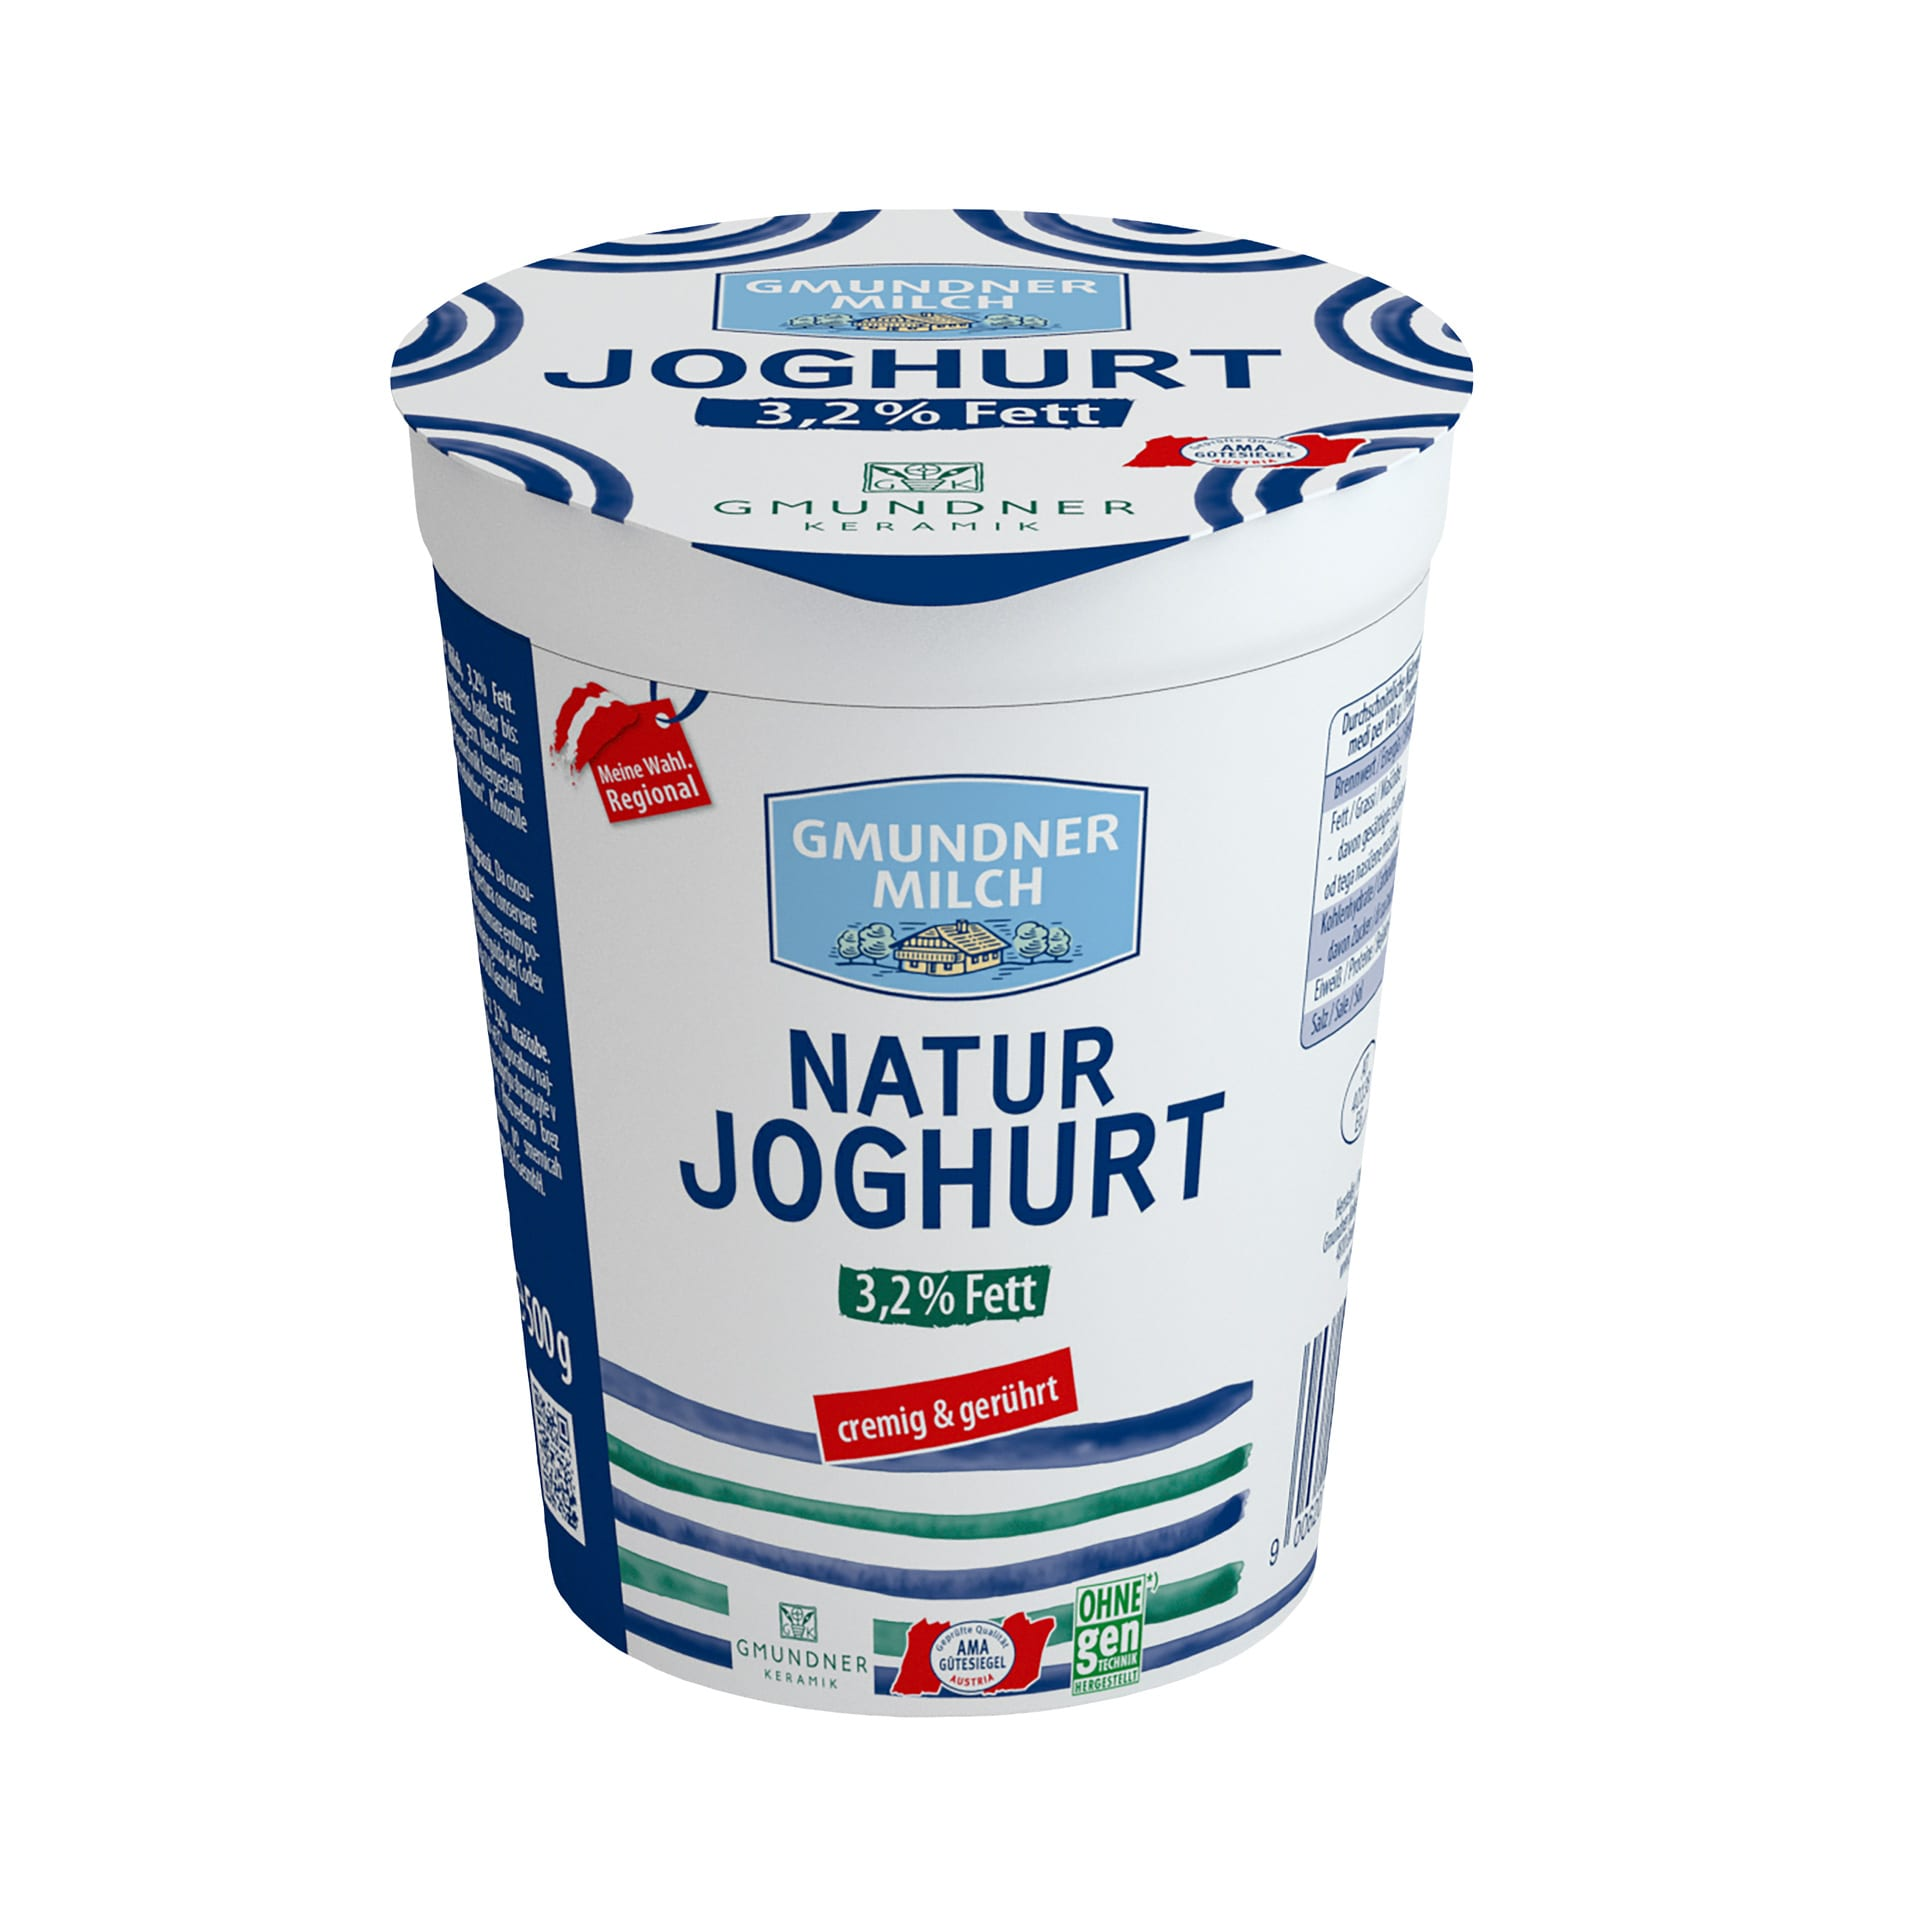 Joghurt 3,2%